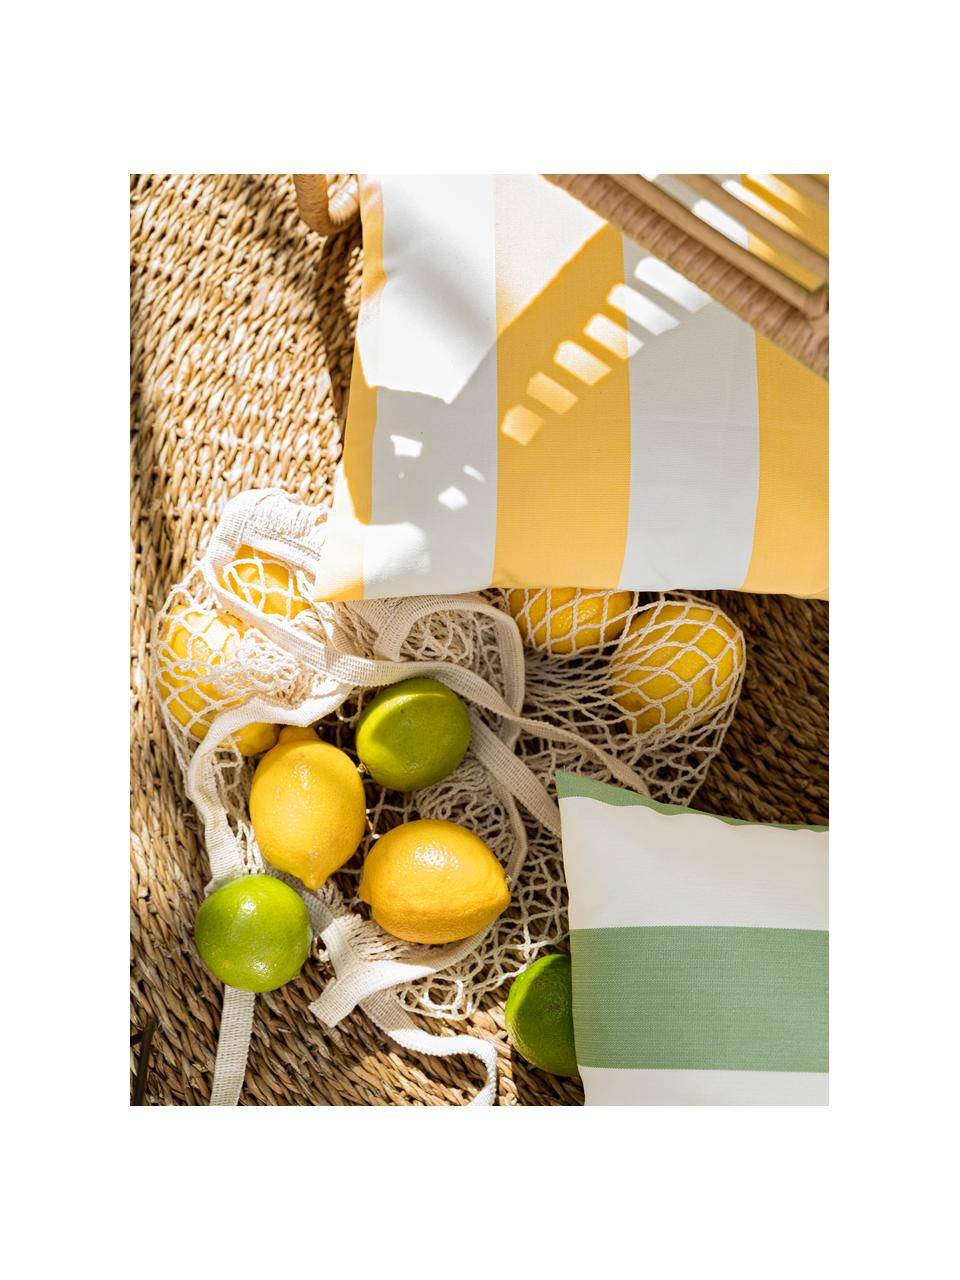 Gestreifte Outdoor-Kissenhülle Santorin in Weiß/Gelb, 100% Polypropylen, Teflon® beschichtet, Gelb, Weiß, 40 x 40 cm